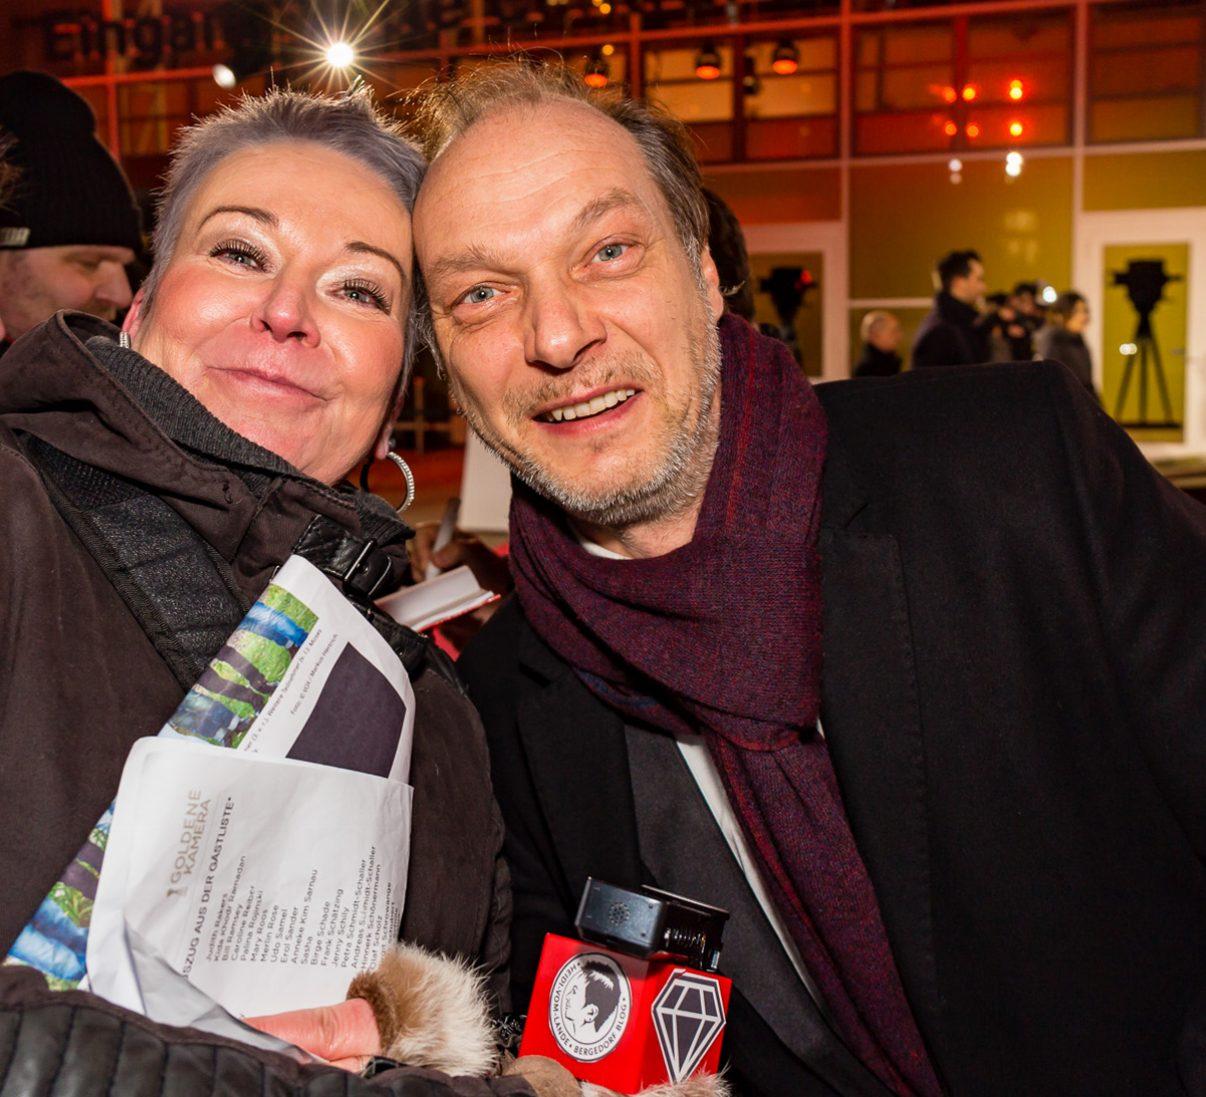 Goldene Kamera, 2018, Funke Mediengruppe, Gala, Musik, Schauspieler, TV, Serie, Verleihung, Preisträger, Fernsehfilm, Trophäe, gold, Hamburg, Martin Brambach